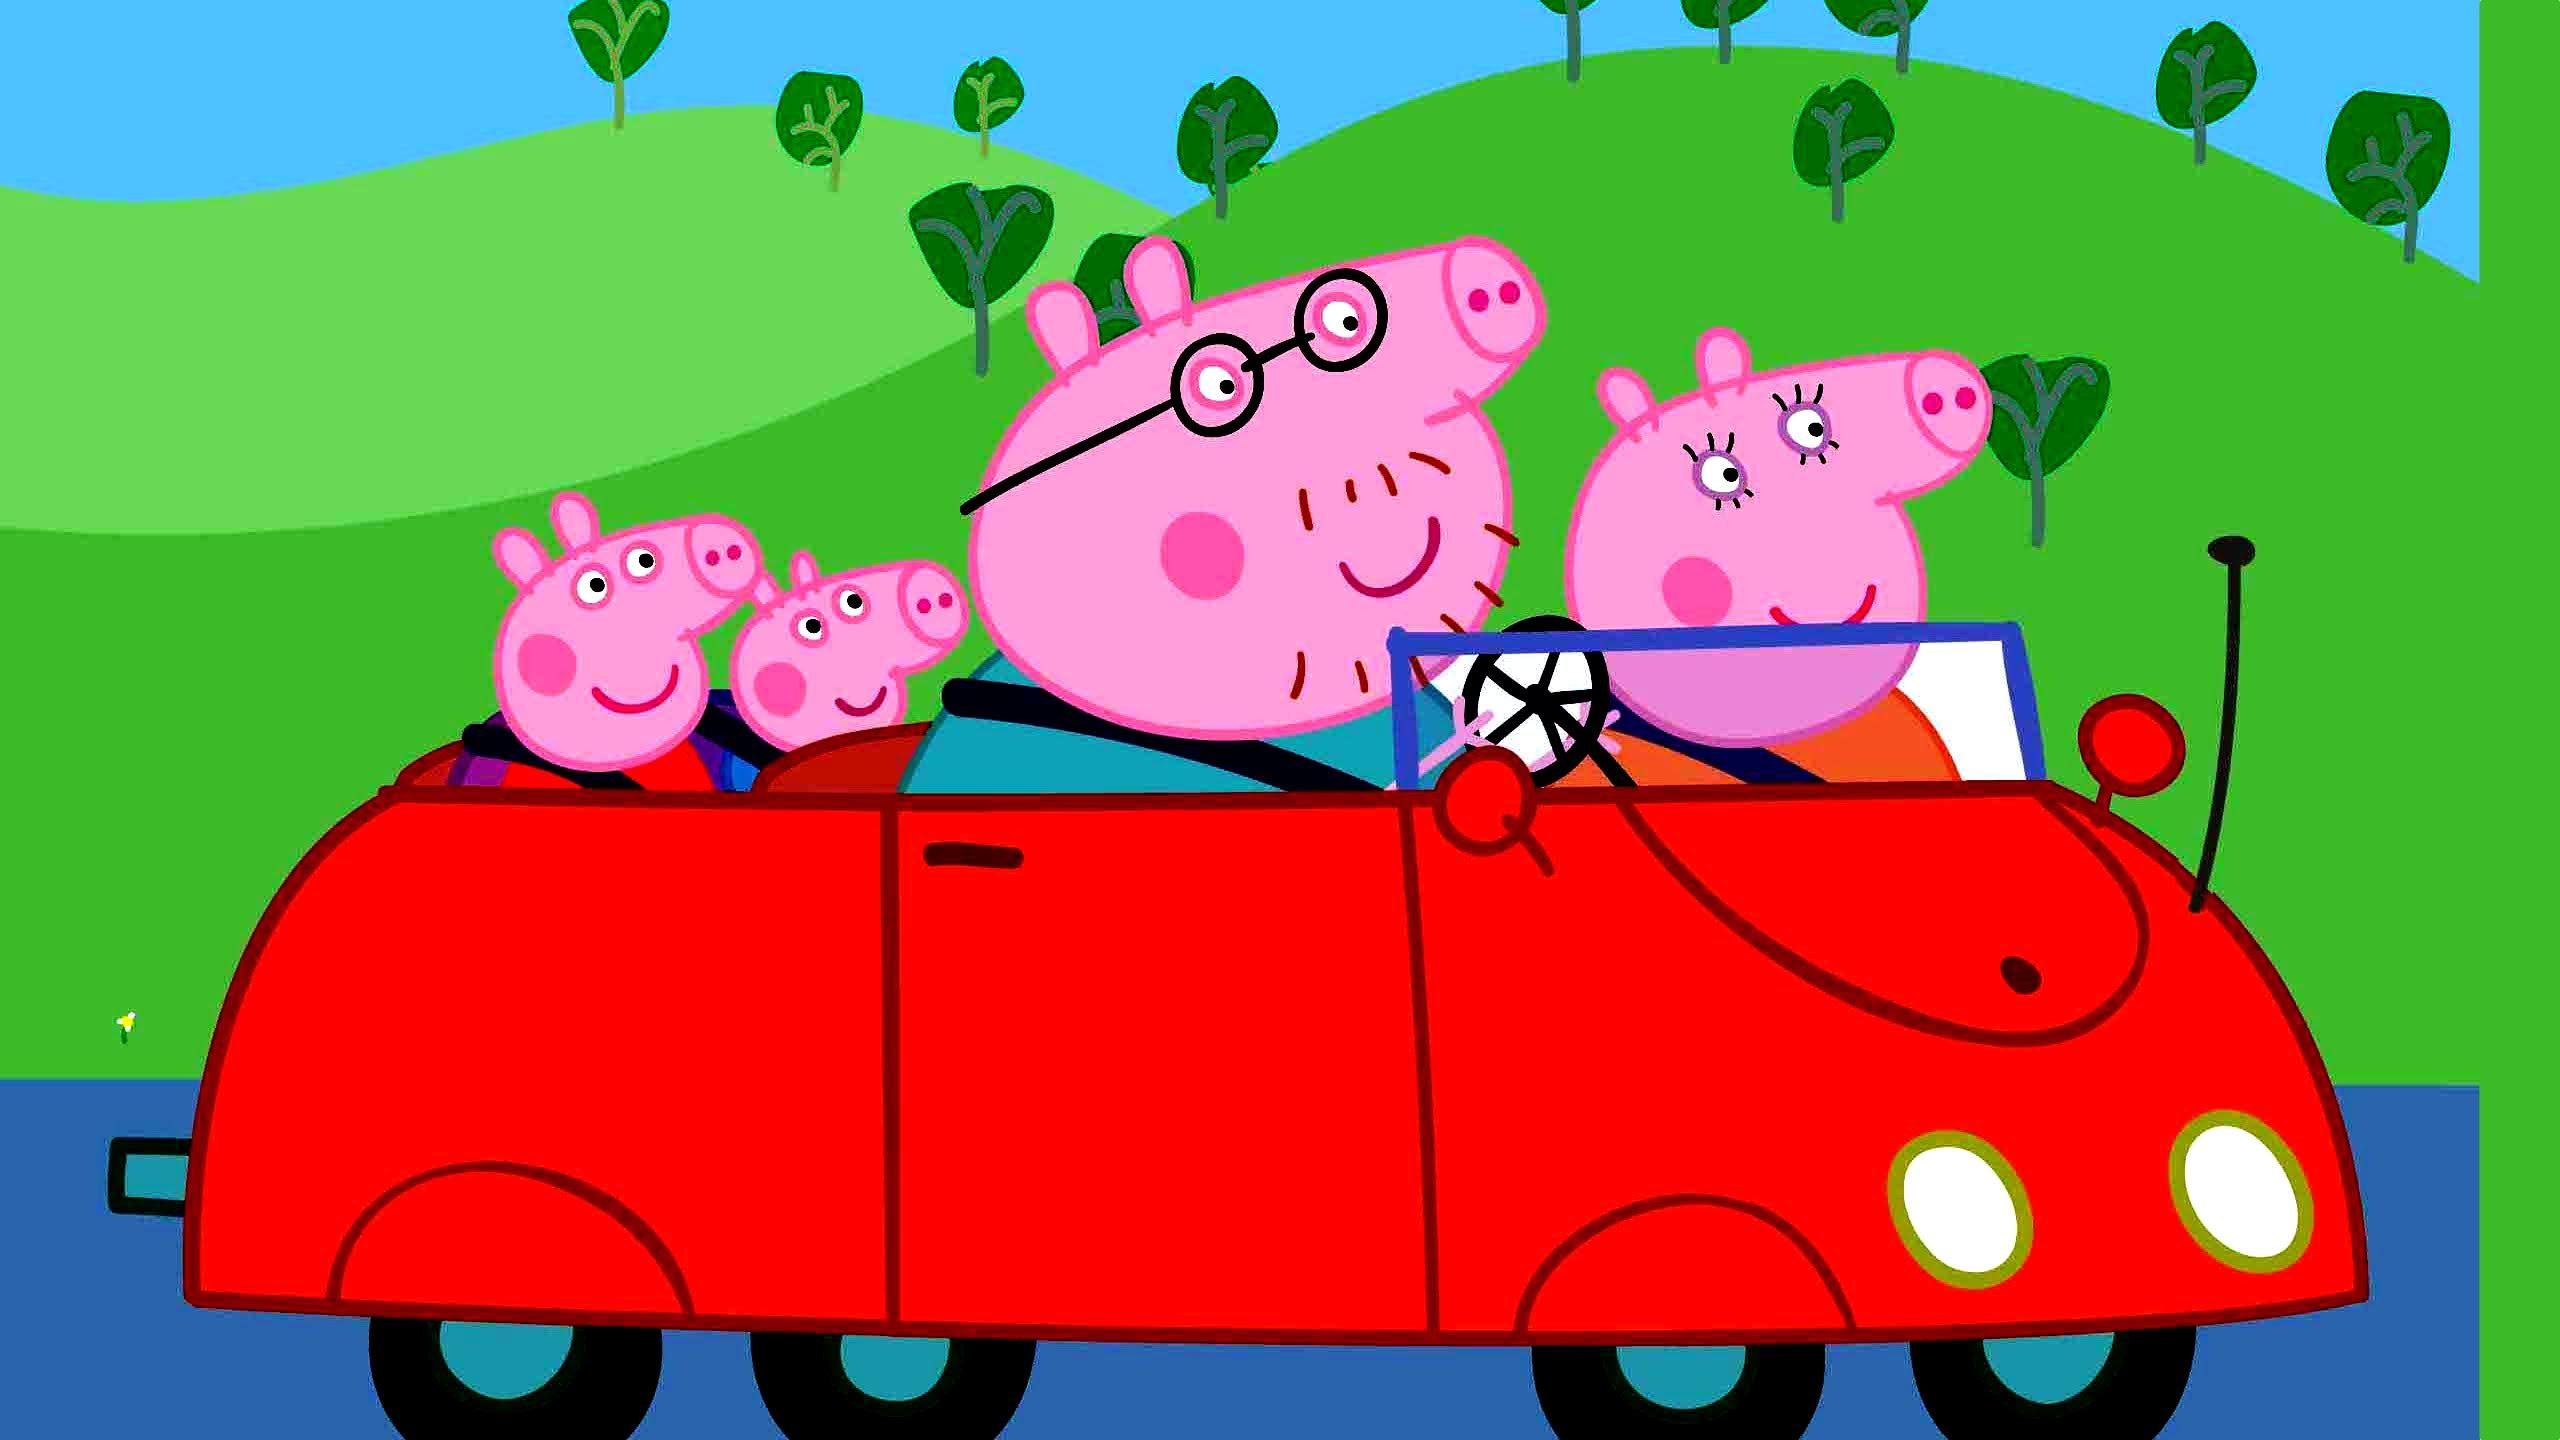 Peppa Pig Fondos de pantalla, peppa pig wallpapers hd Y Tu Mama Tambien